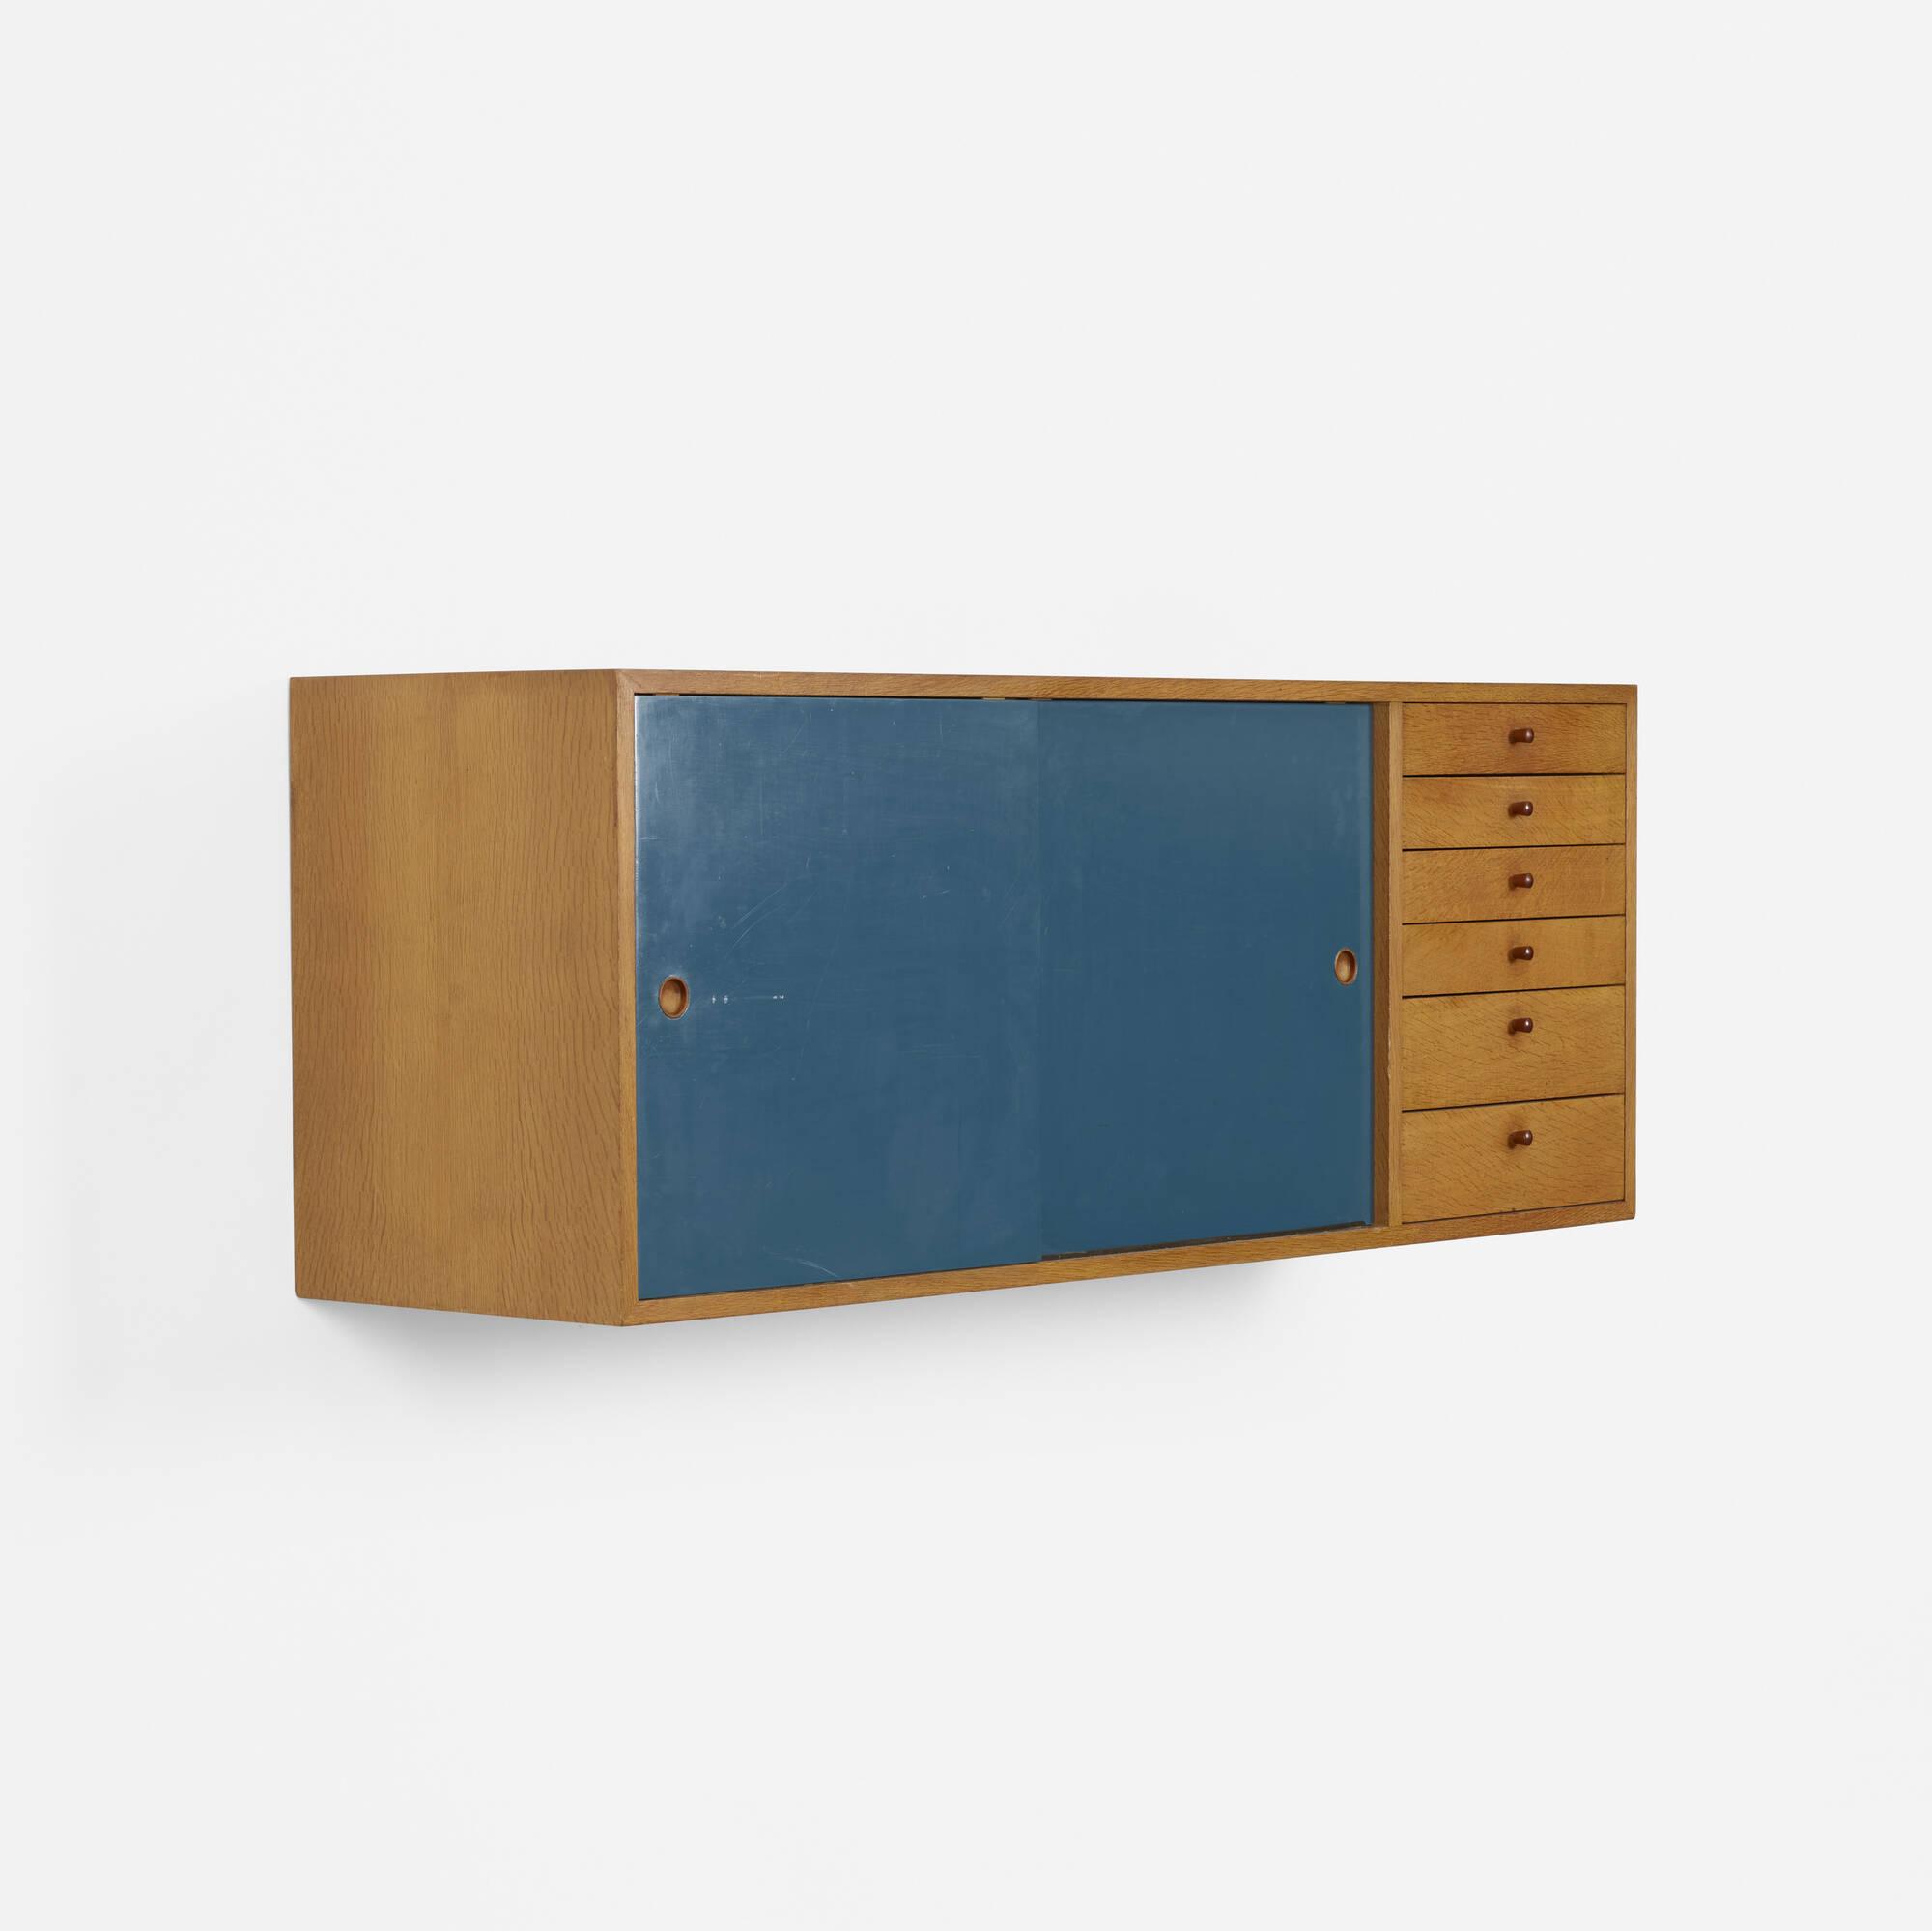 263: Arne Vodder / wall-mounted cabinet (1 of 3)